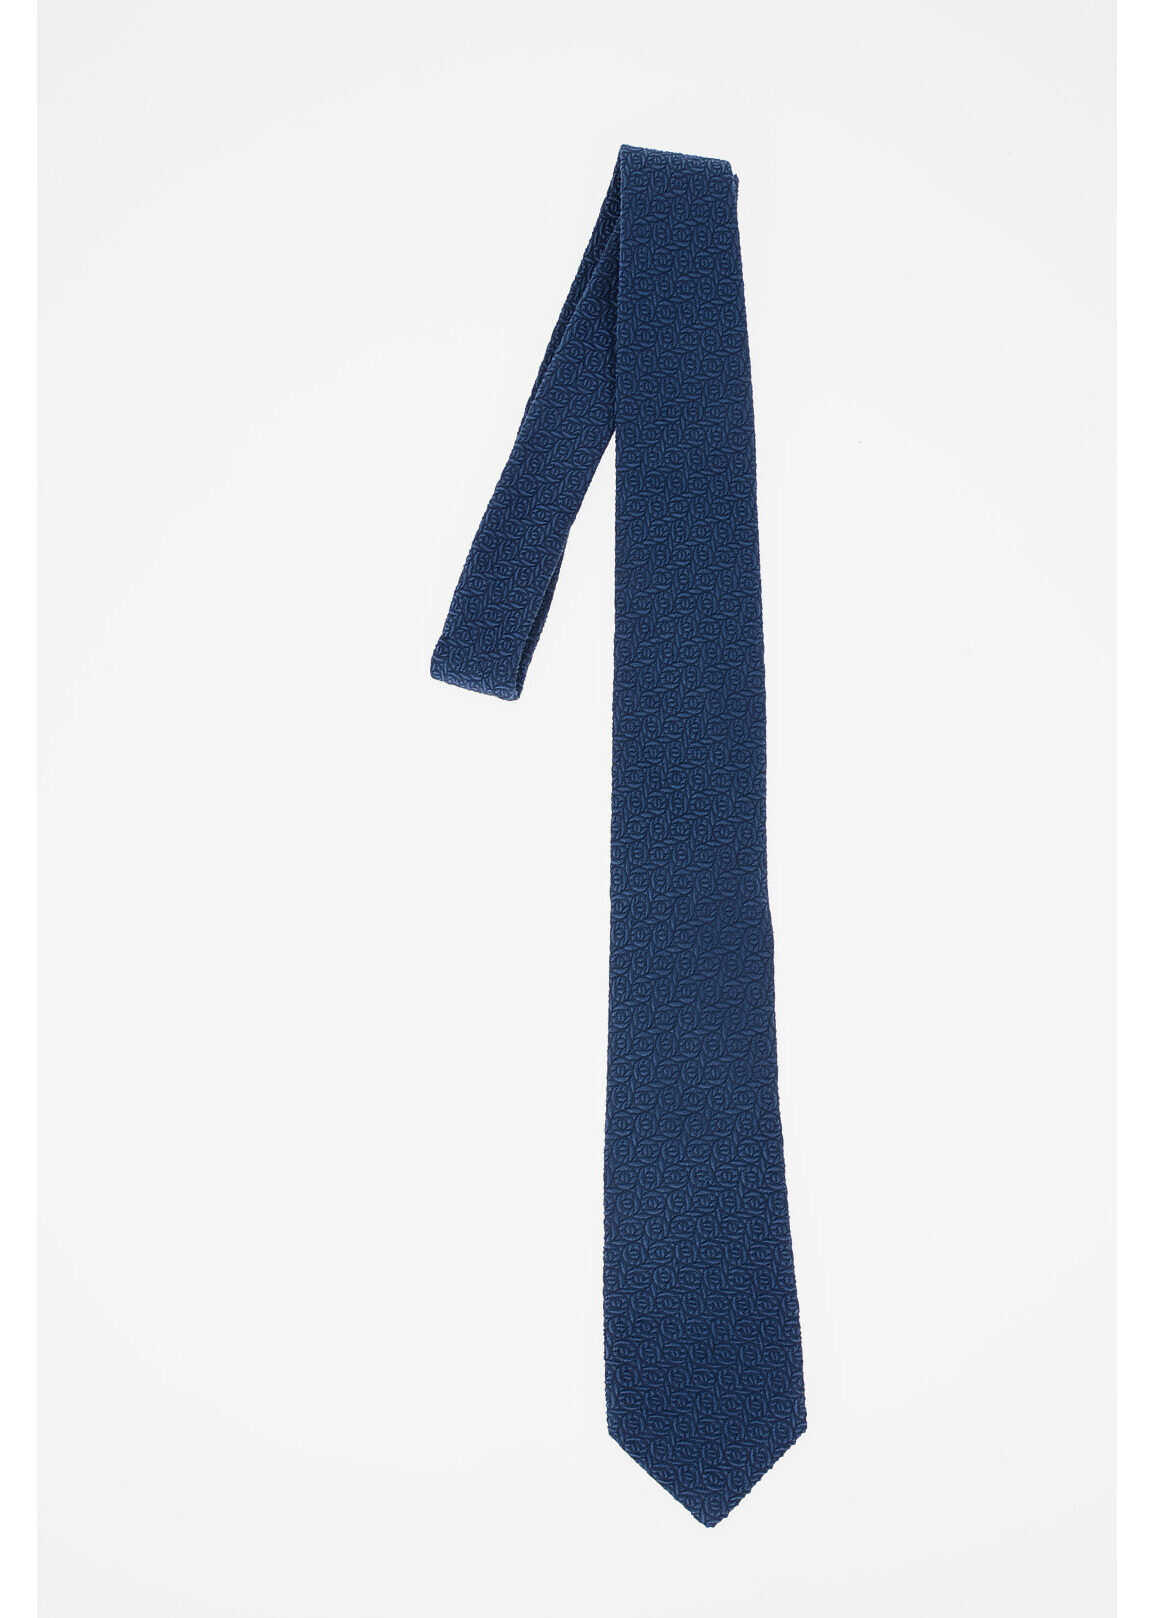 CORNELIANI CC COLLECTION Silk Printed Tie BLUE